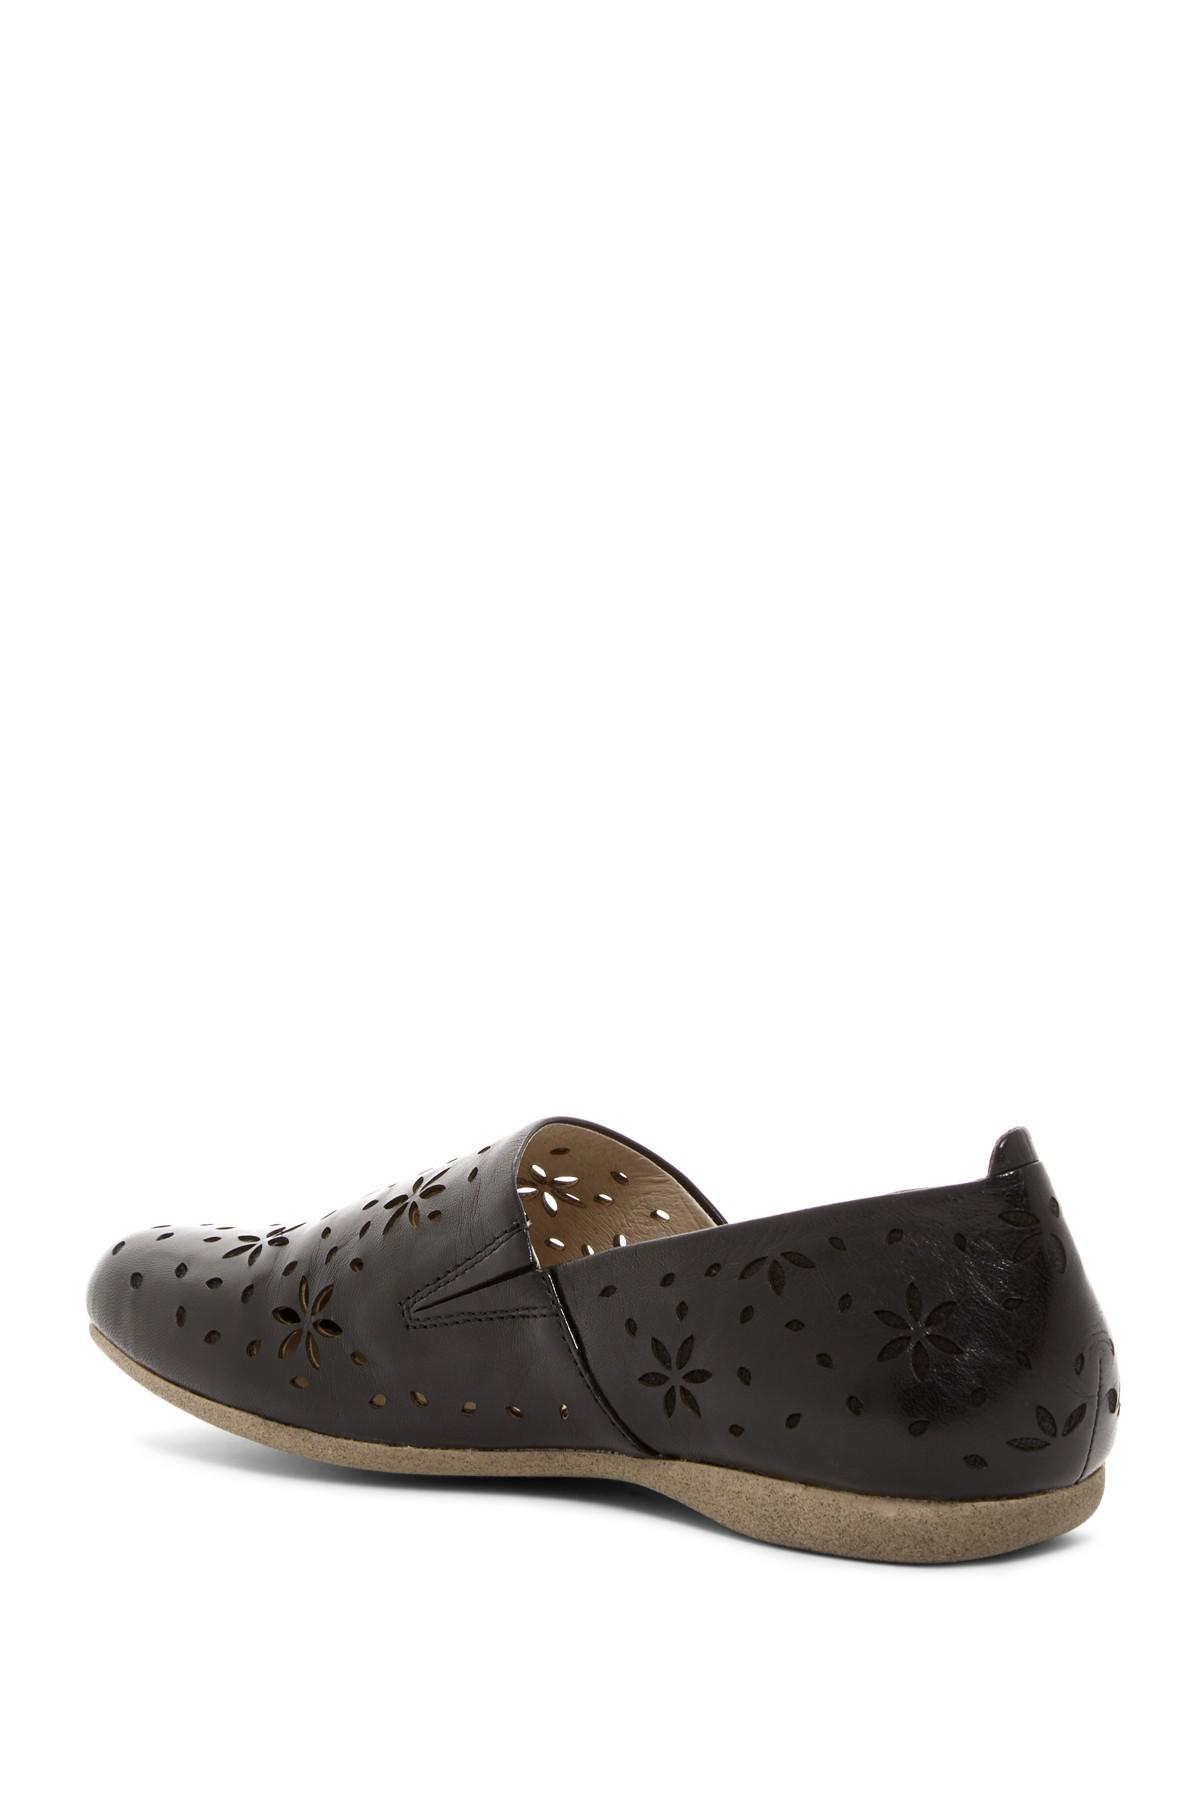 d3368c15b148b Josef seibel Fiona 31 Leather Flat in Black